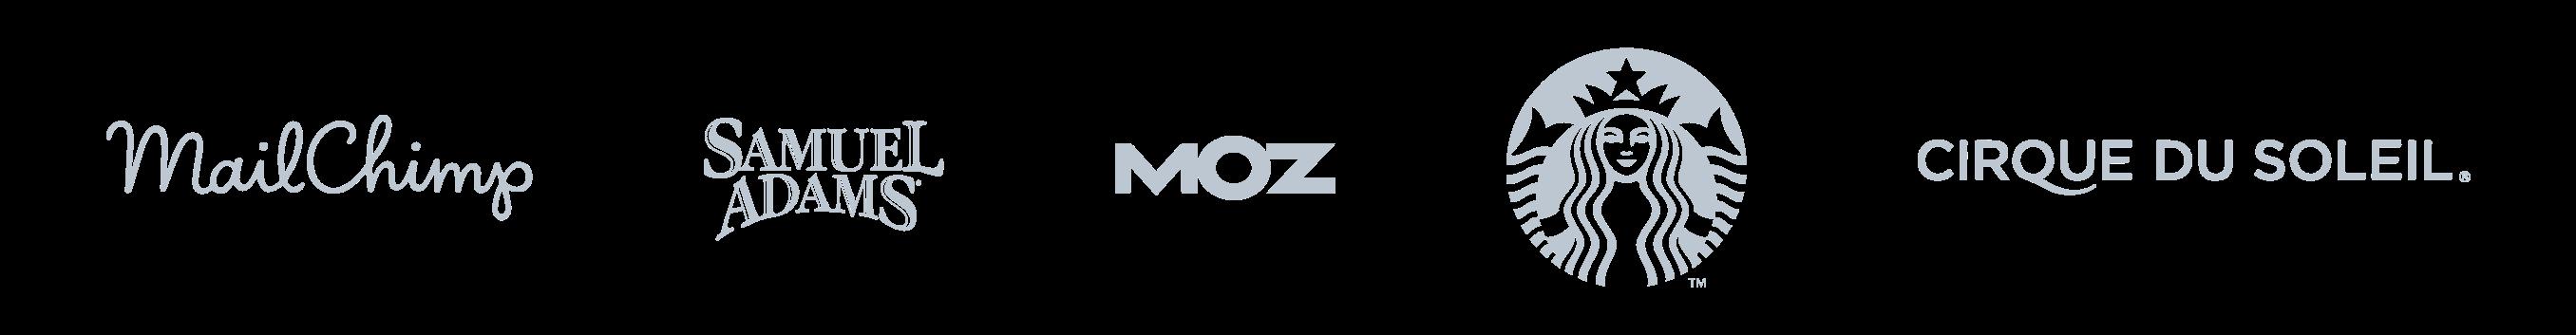 logos-list